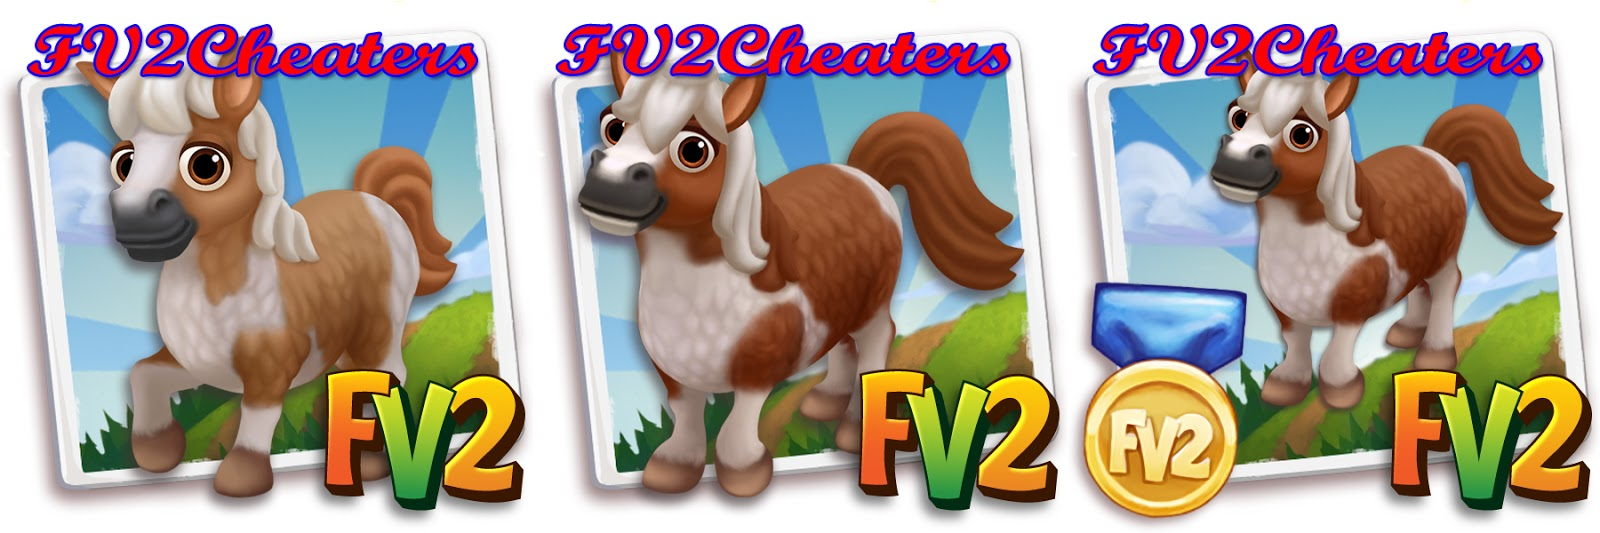 Charming Farmville Horse #10: Farmville 2 Cheat Code For VIP Miniature Brown Painted Horse